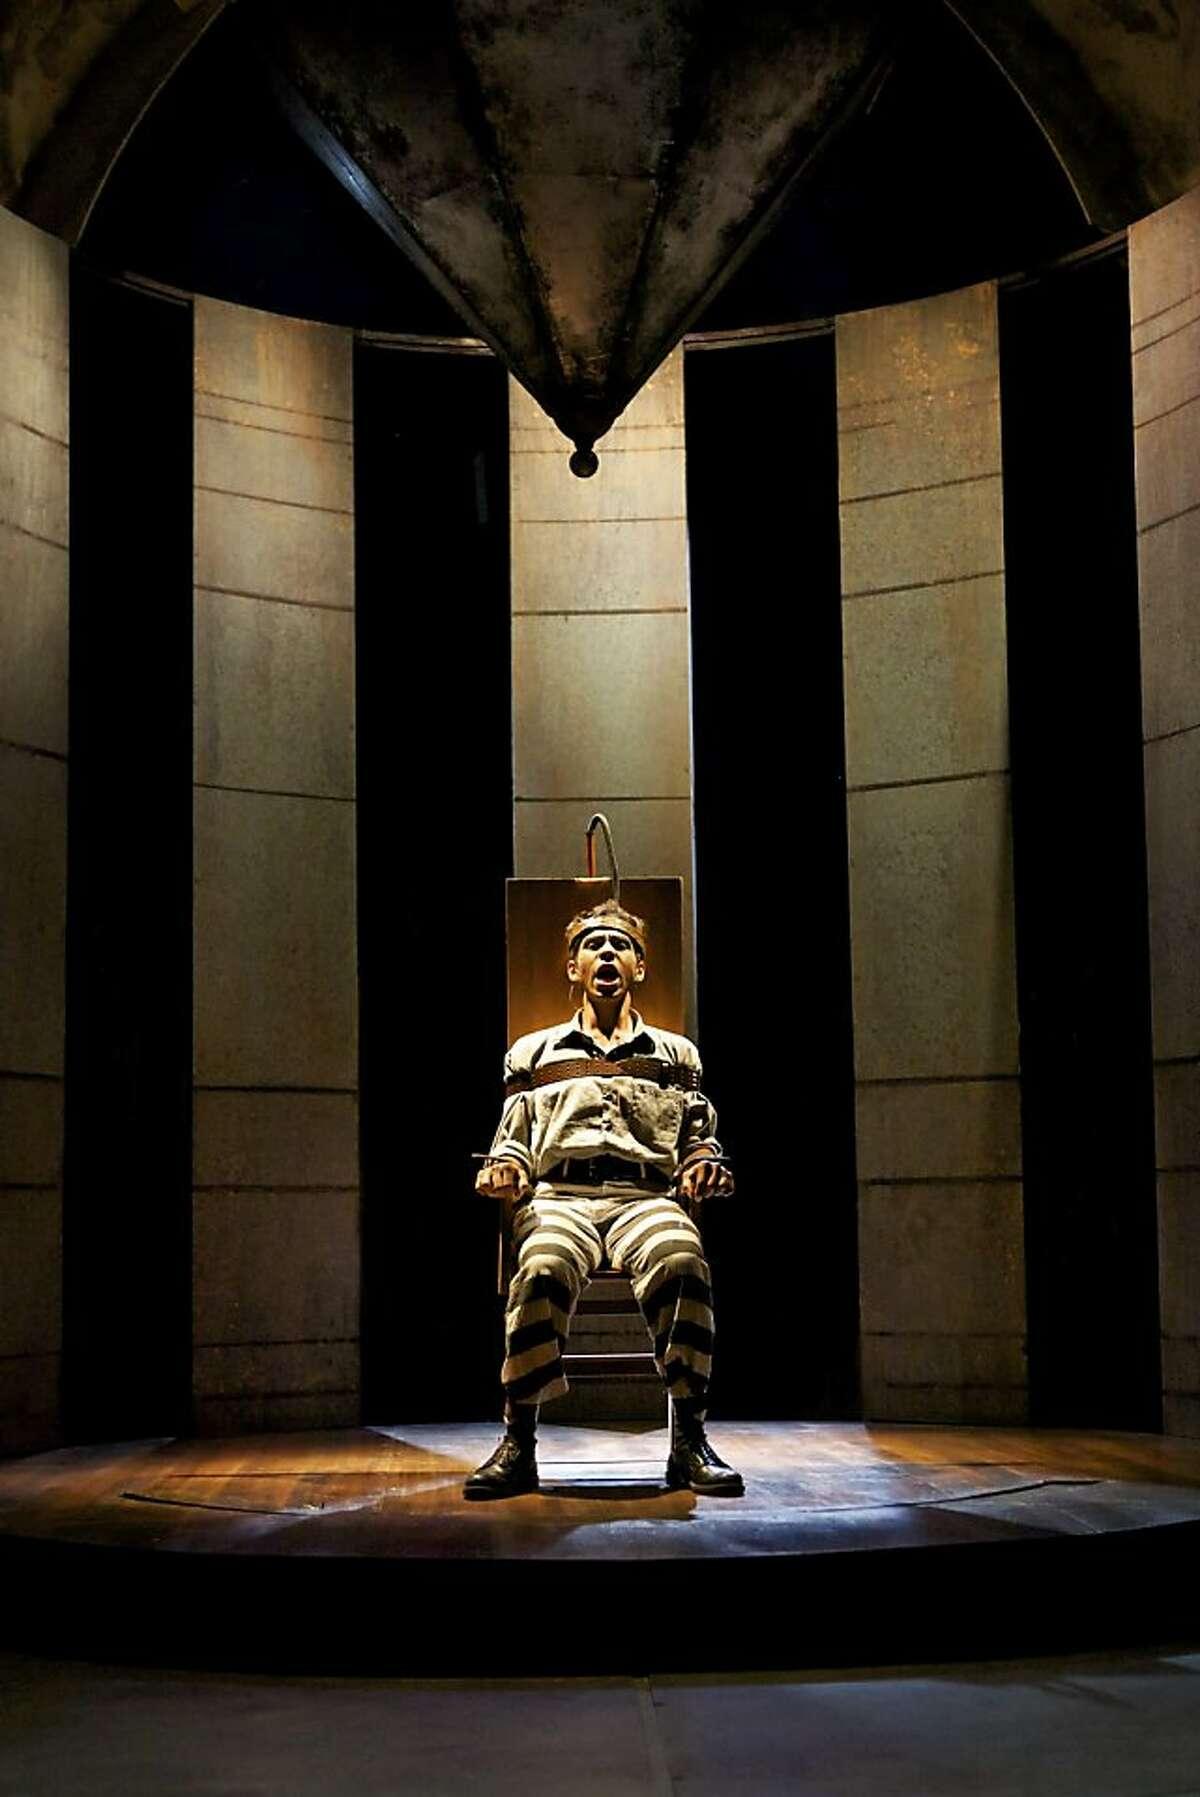 Giuseppe Zangara (Aleph Ayin) sings as he awaits execution in Shotgun Players' production of the Stephen Sondheim musical